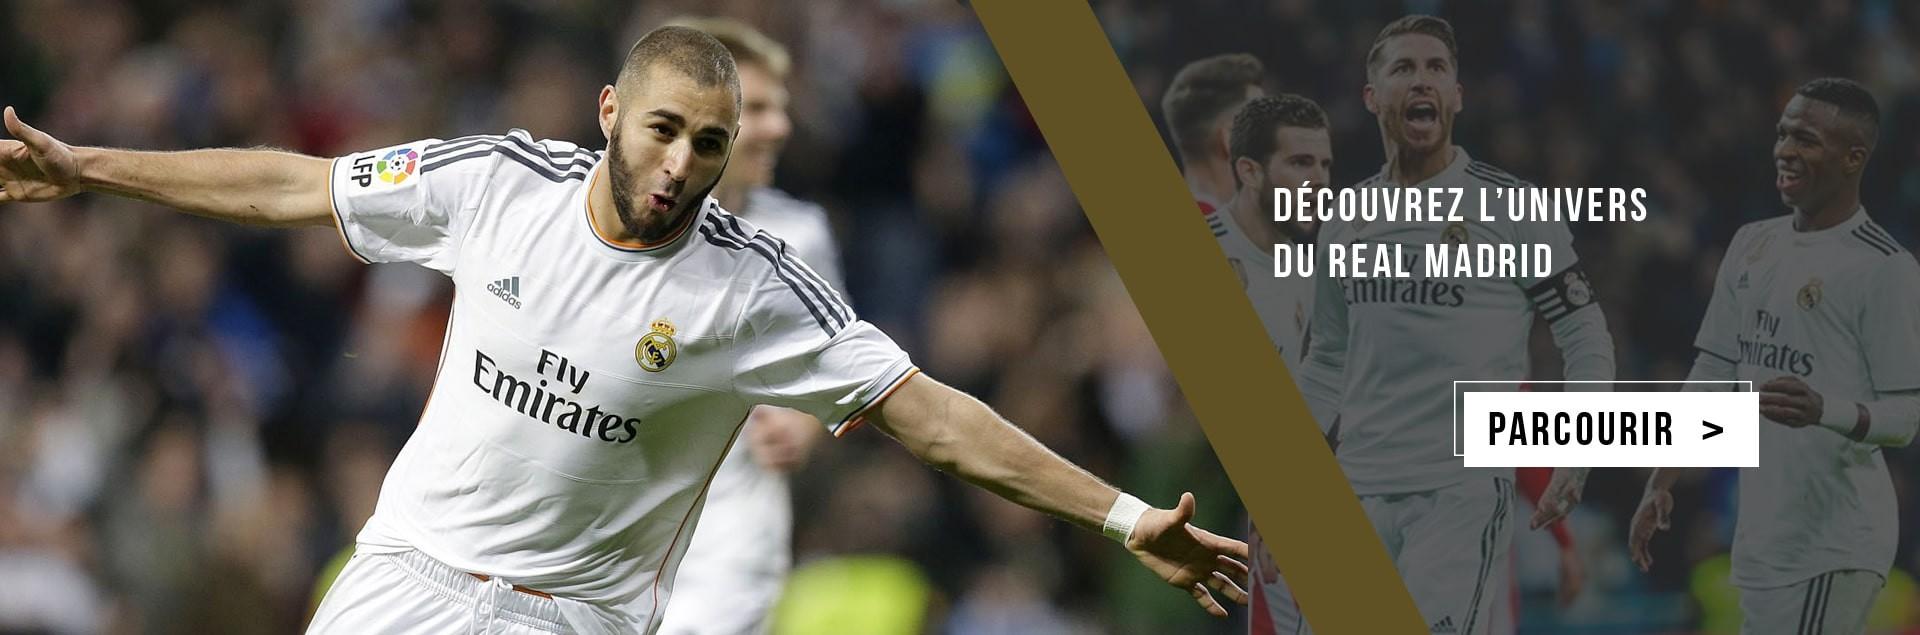 L'univers du Real Madrid